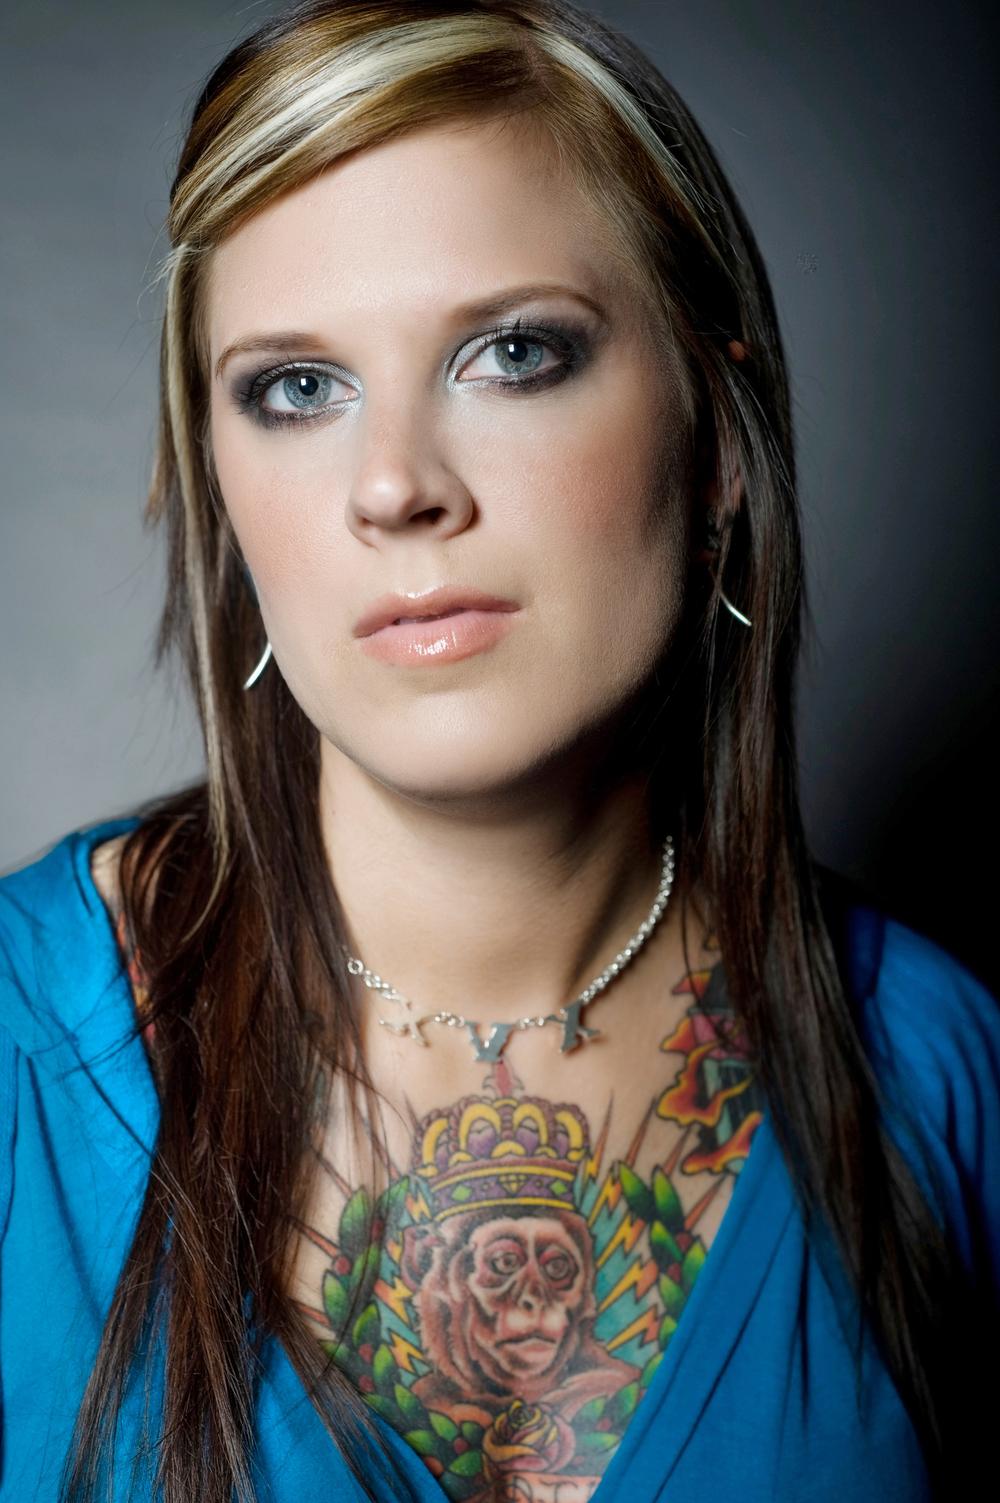 Danielle Konya; image courtesy of Vegan Treats